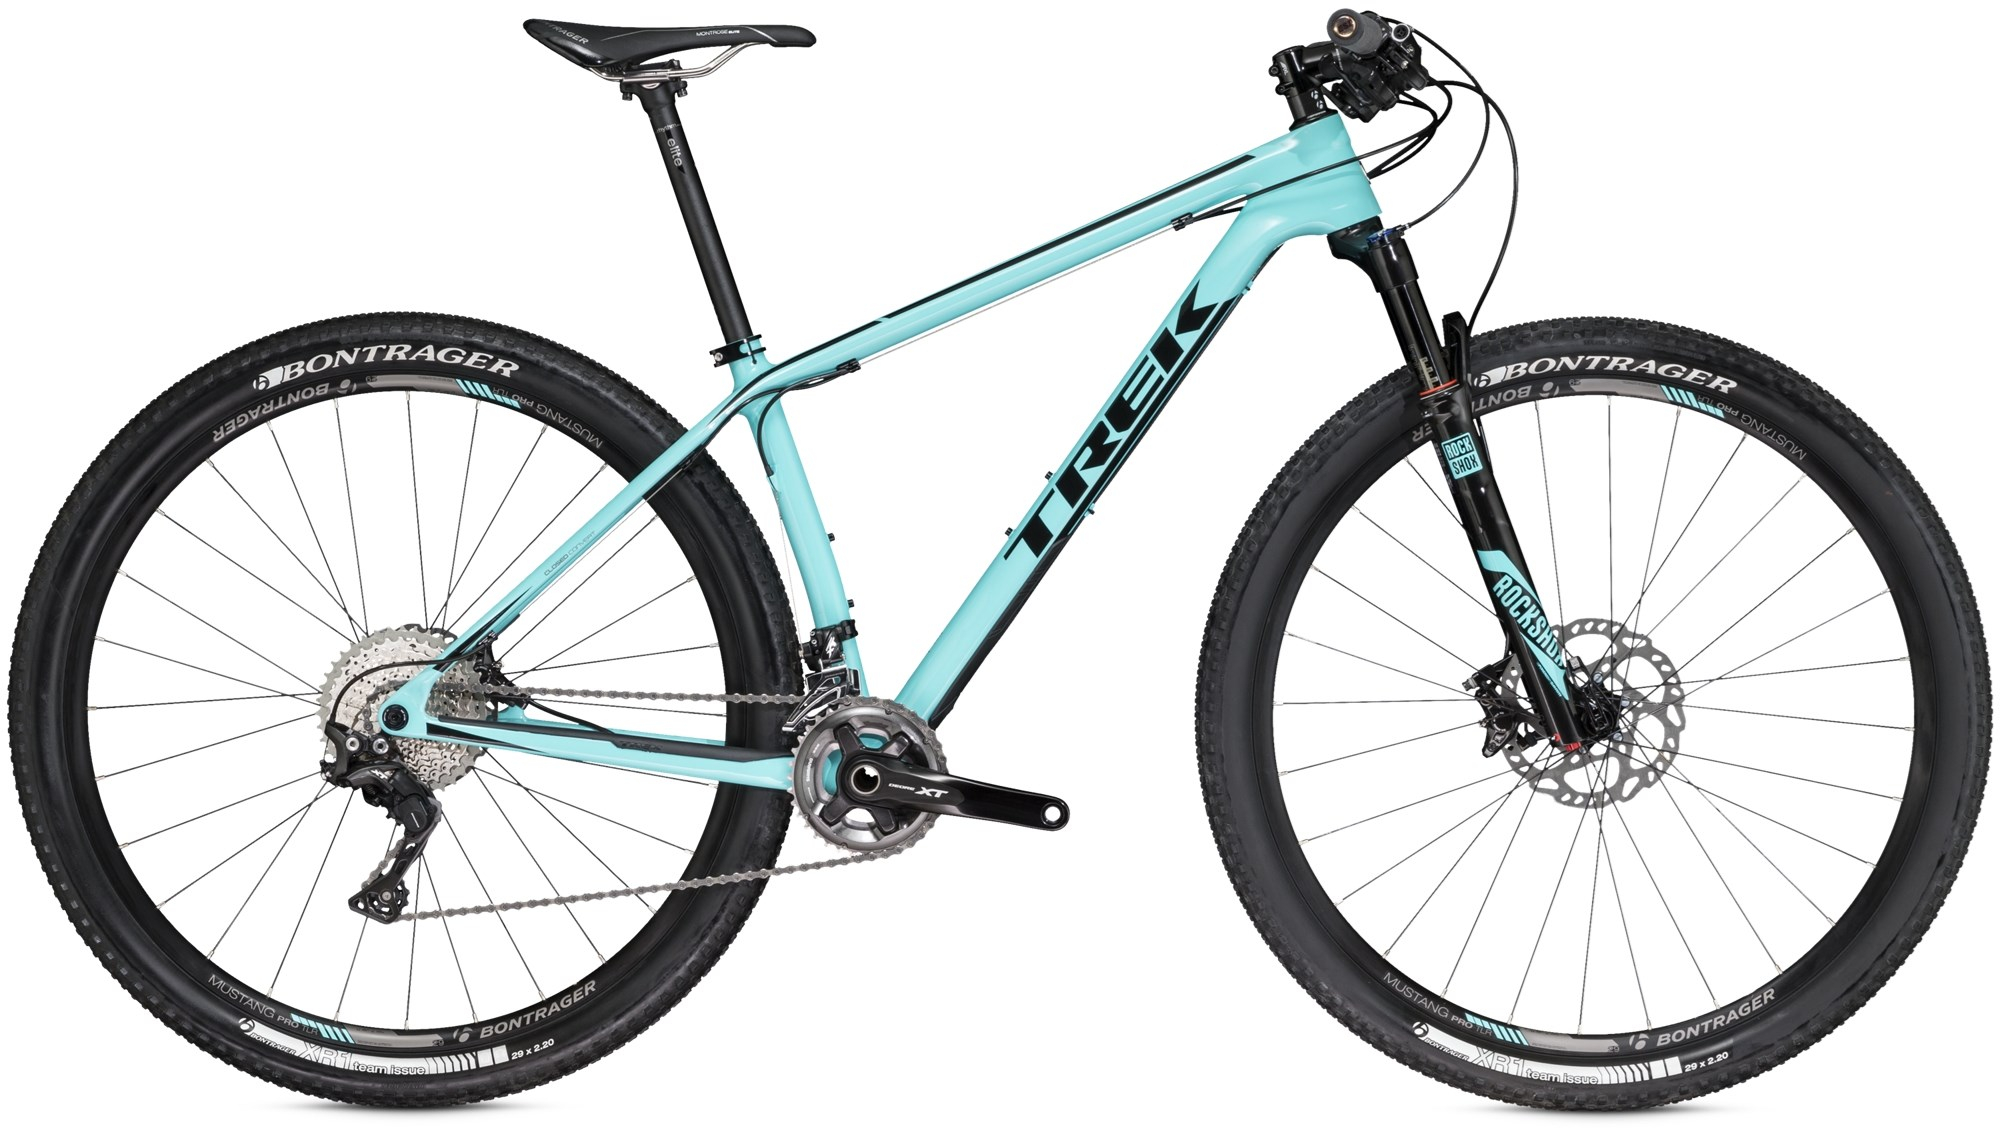 b44d2199b30 Trek Superfly 9.8 Hardtail Mountain Bike £1,399.00